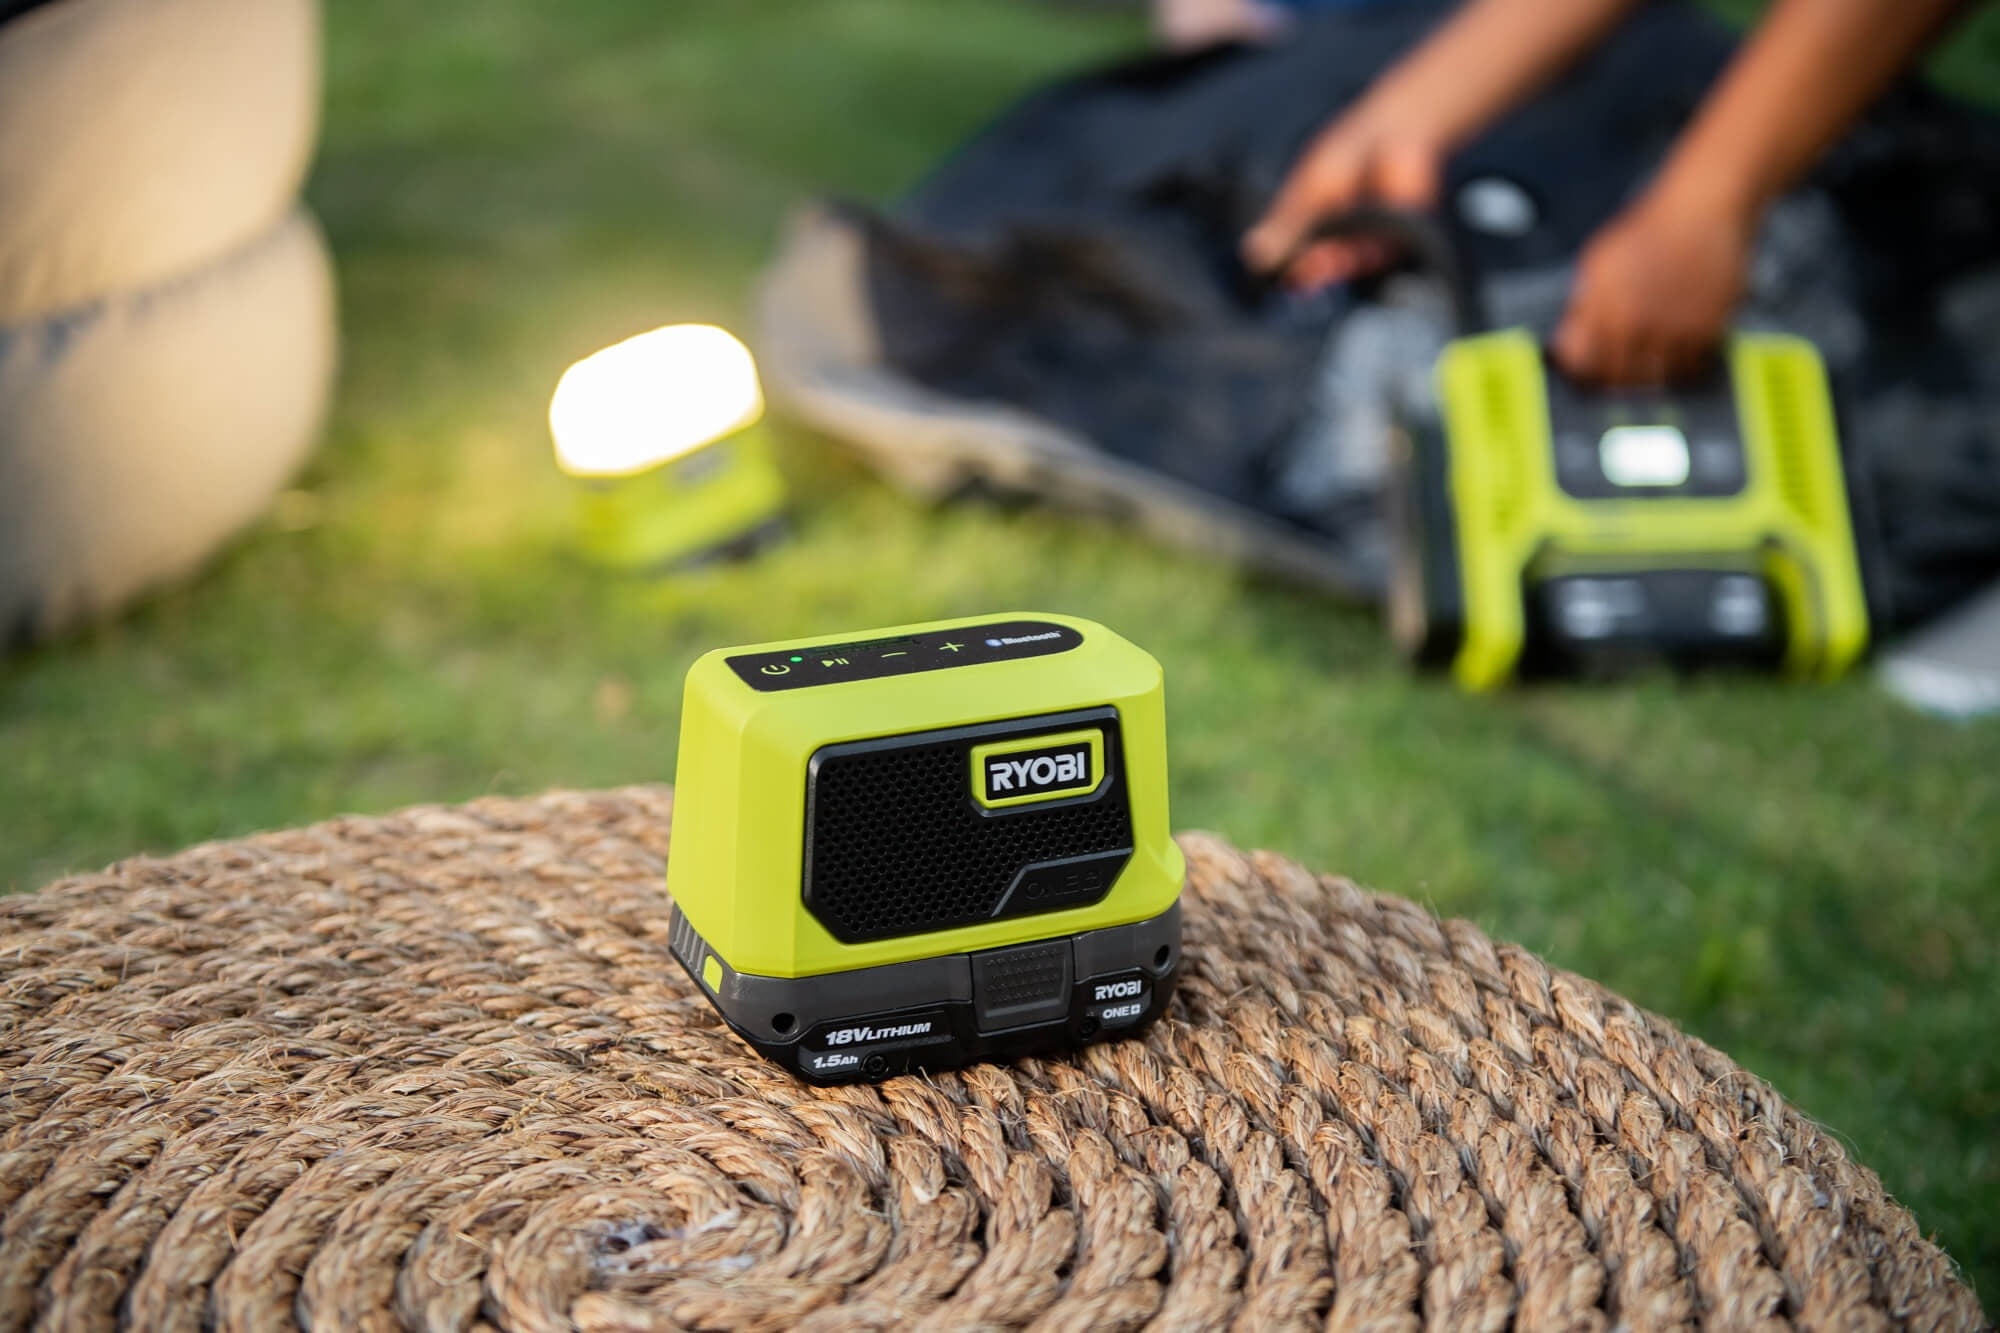 Motor vehicle, Automotive tire, Photograph, Light, Green, Grass, Yellow